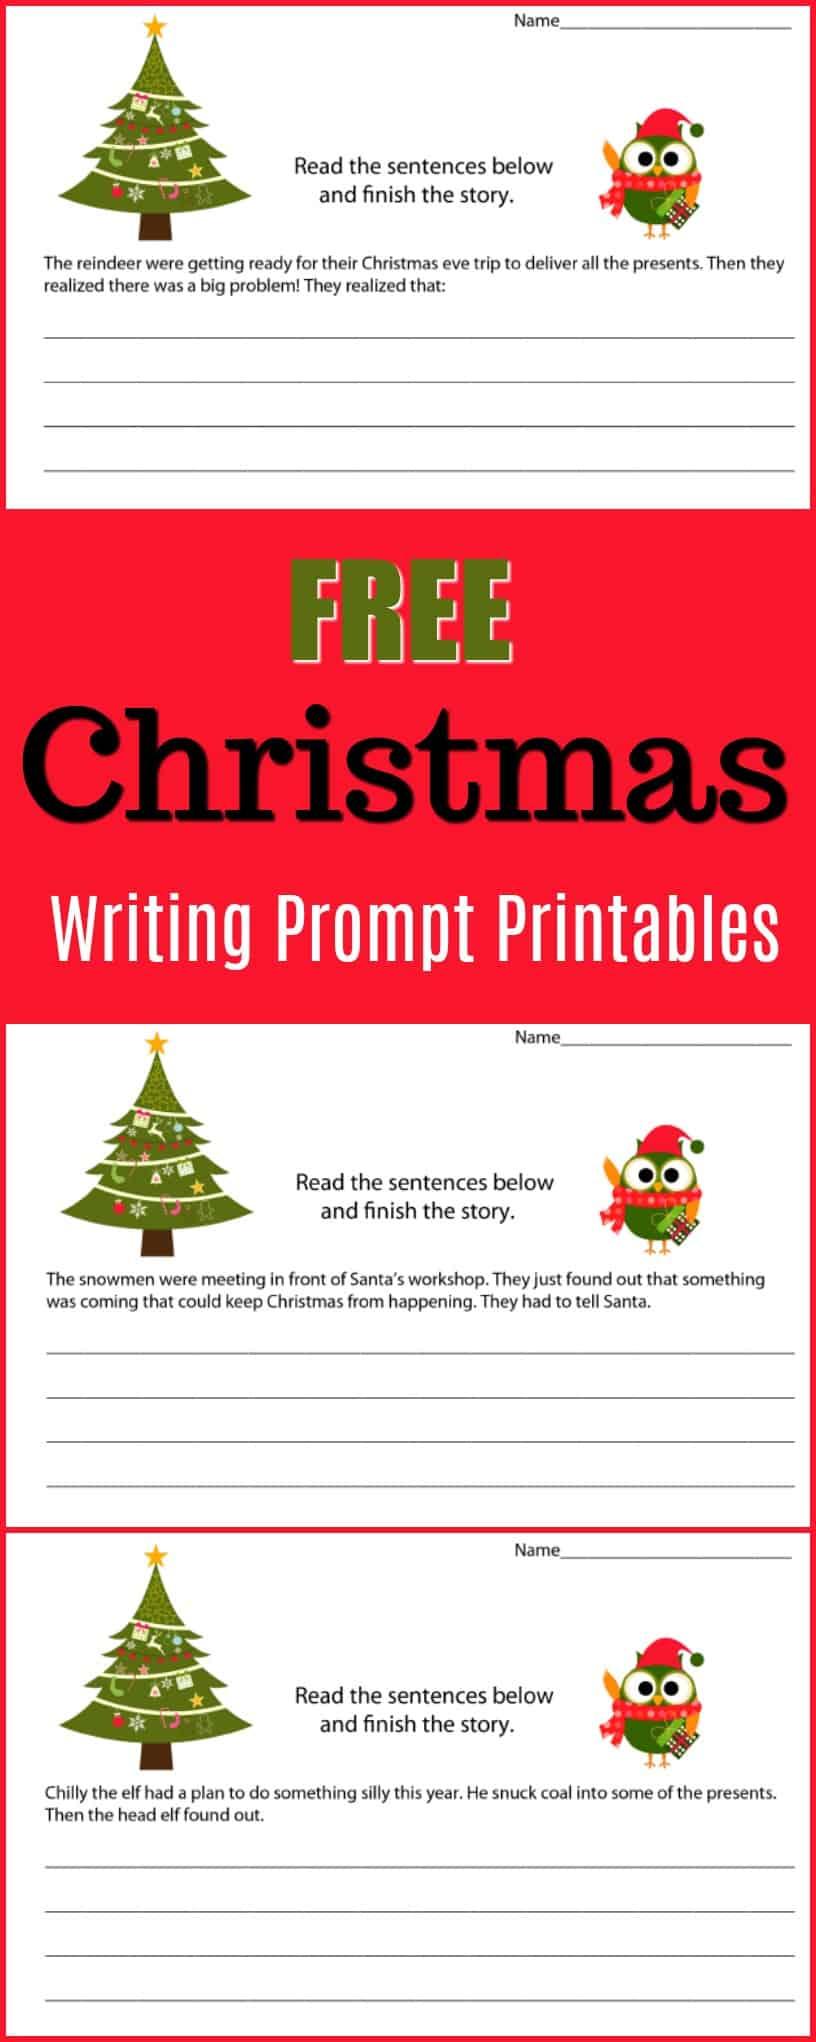 Free Christmas Writing Prompt Printables